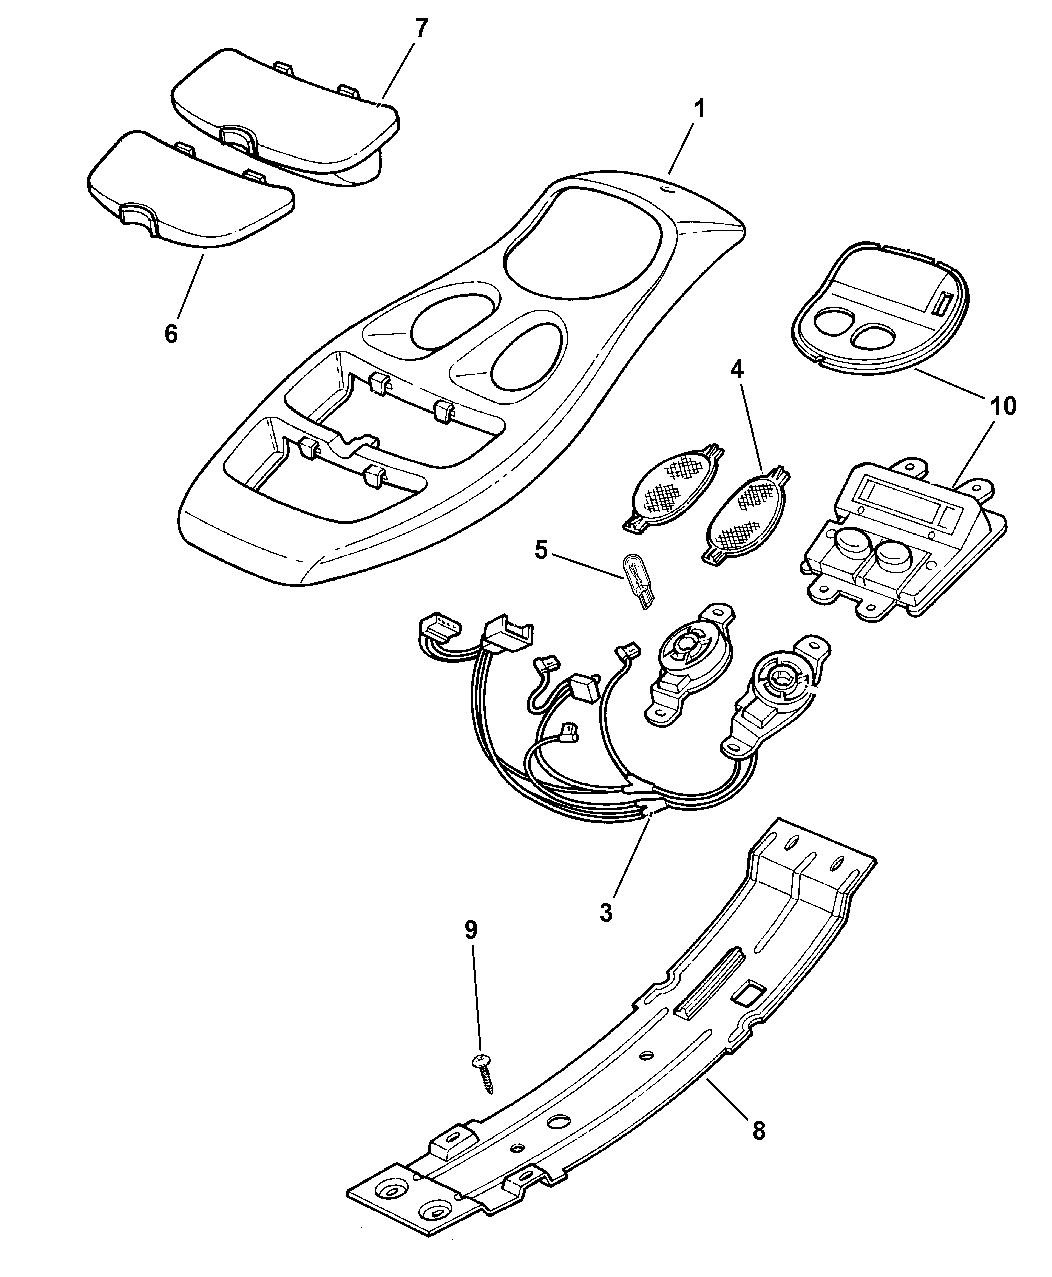 Dodge Dakota Overhead Console